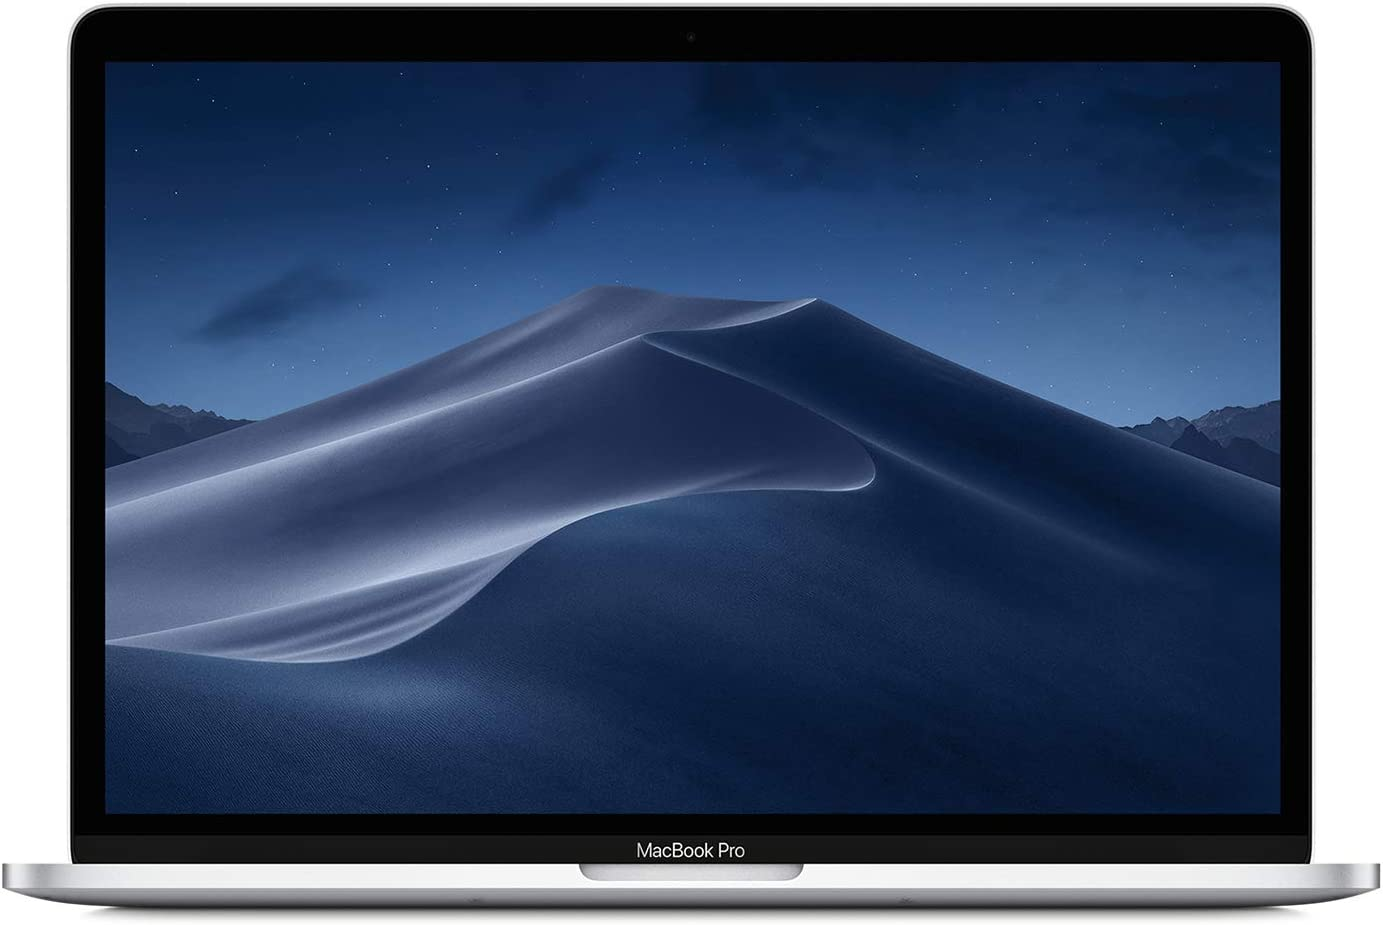 "Apple MacBook Pro (13"" Retina, 2.3GHz Dual-Core Intel Core i5, 8GB RAM, 128GB SSD) - Silver (Latest Model)"